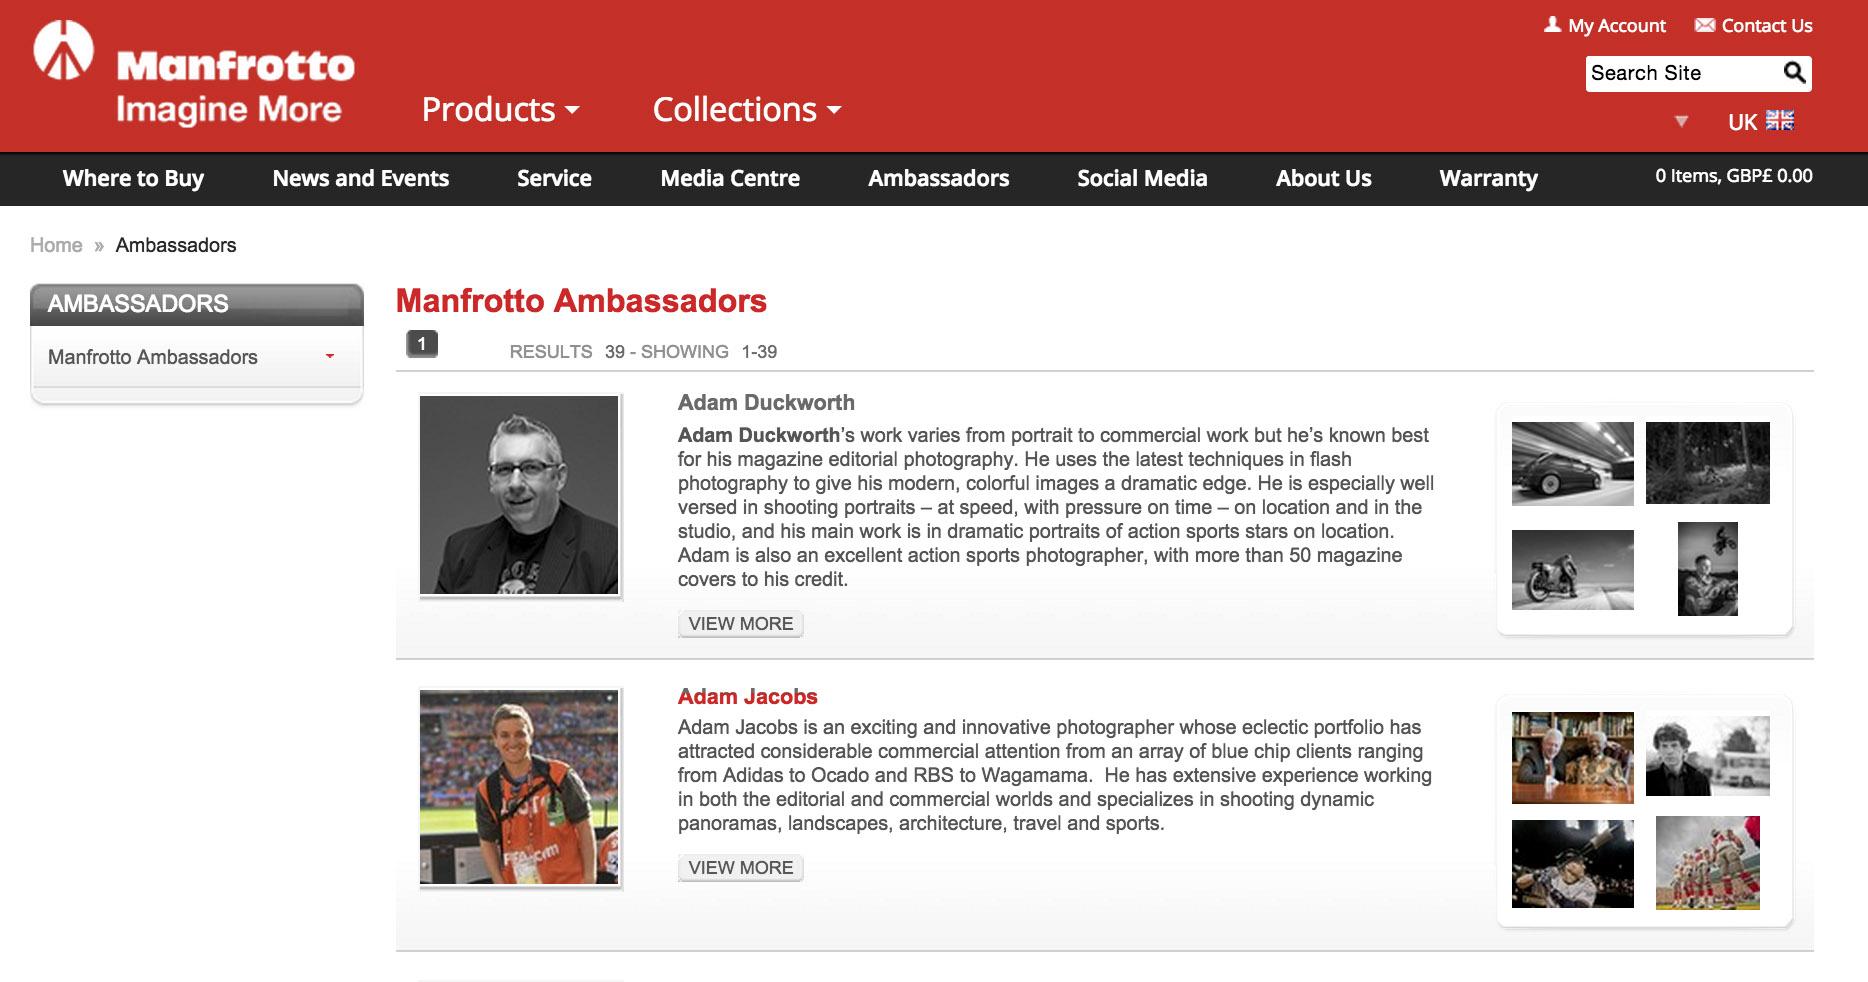 Manfrotto Ambassador Page_Adam Jacobs.jpg